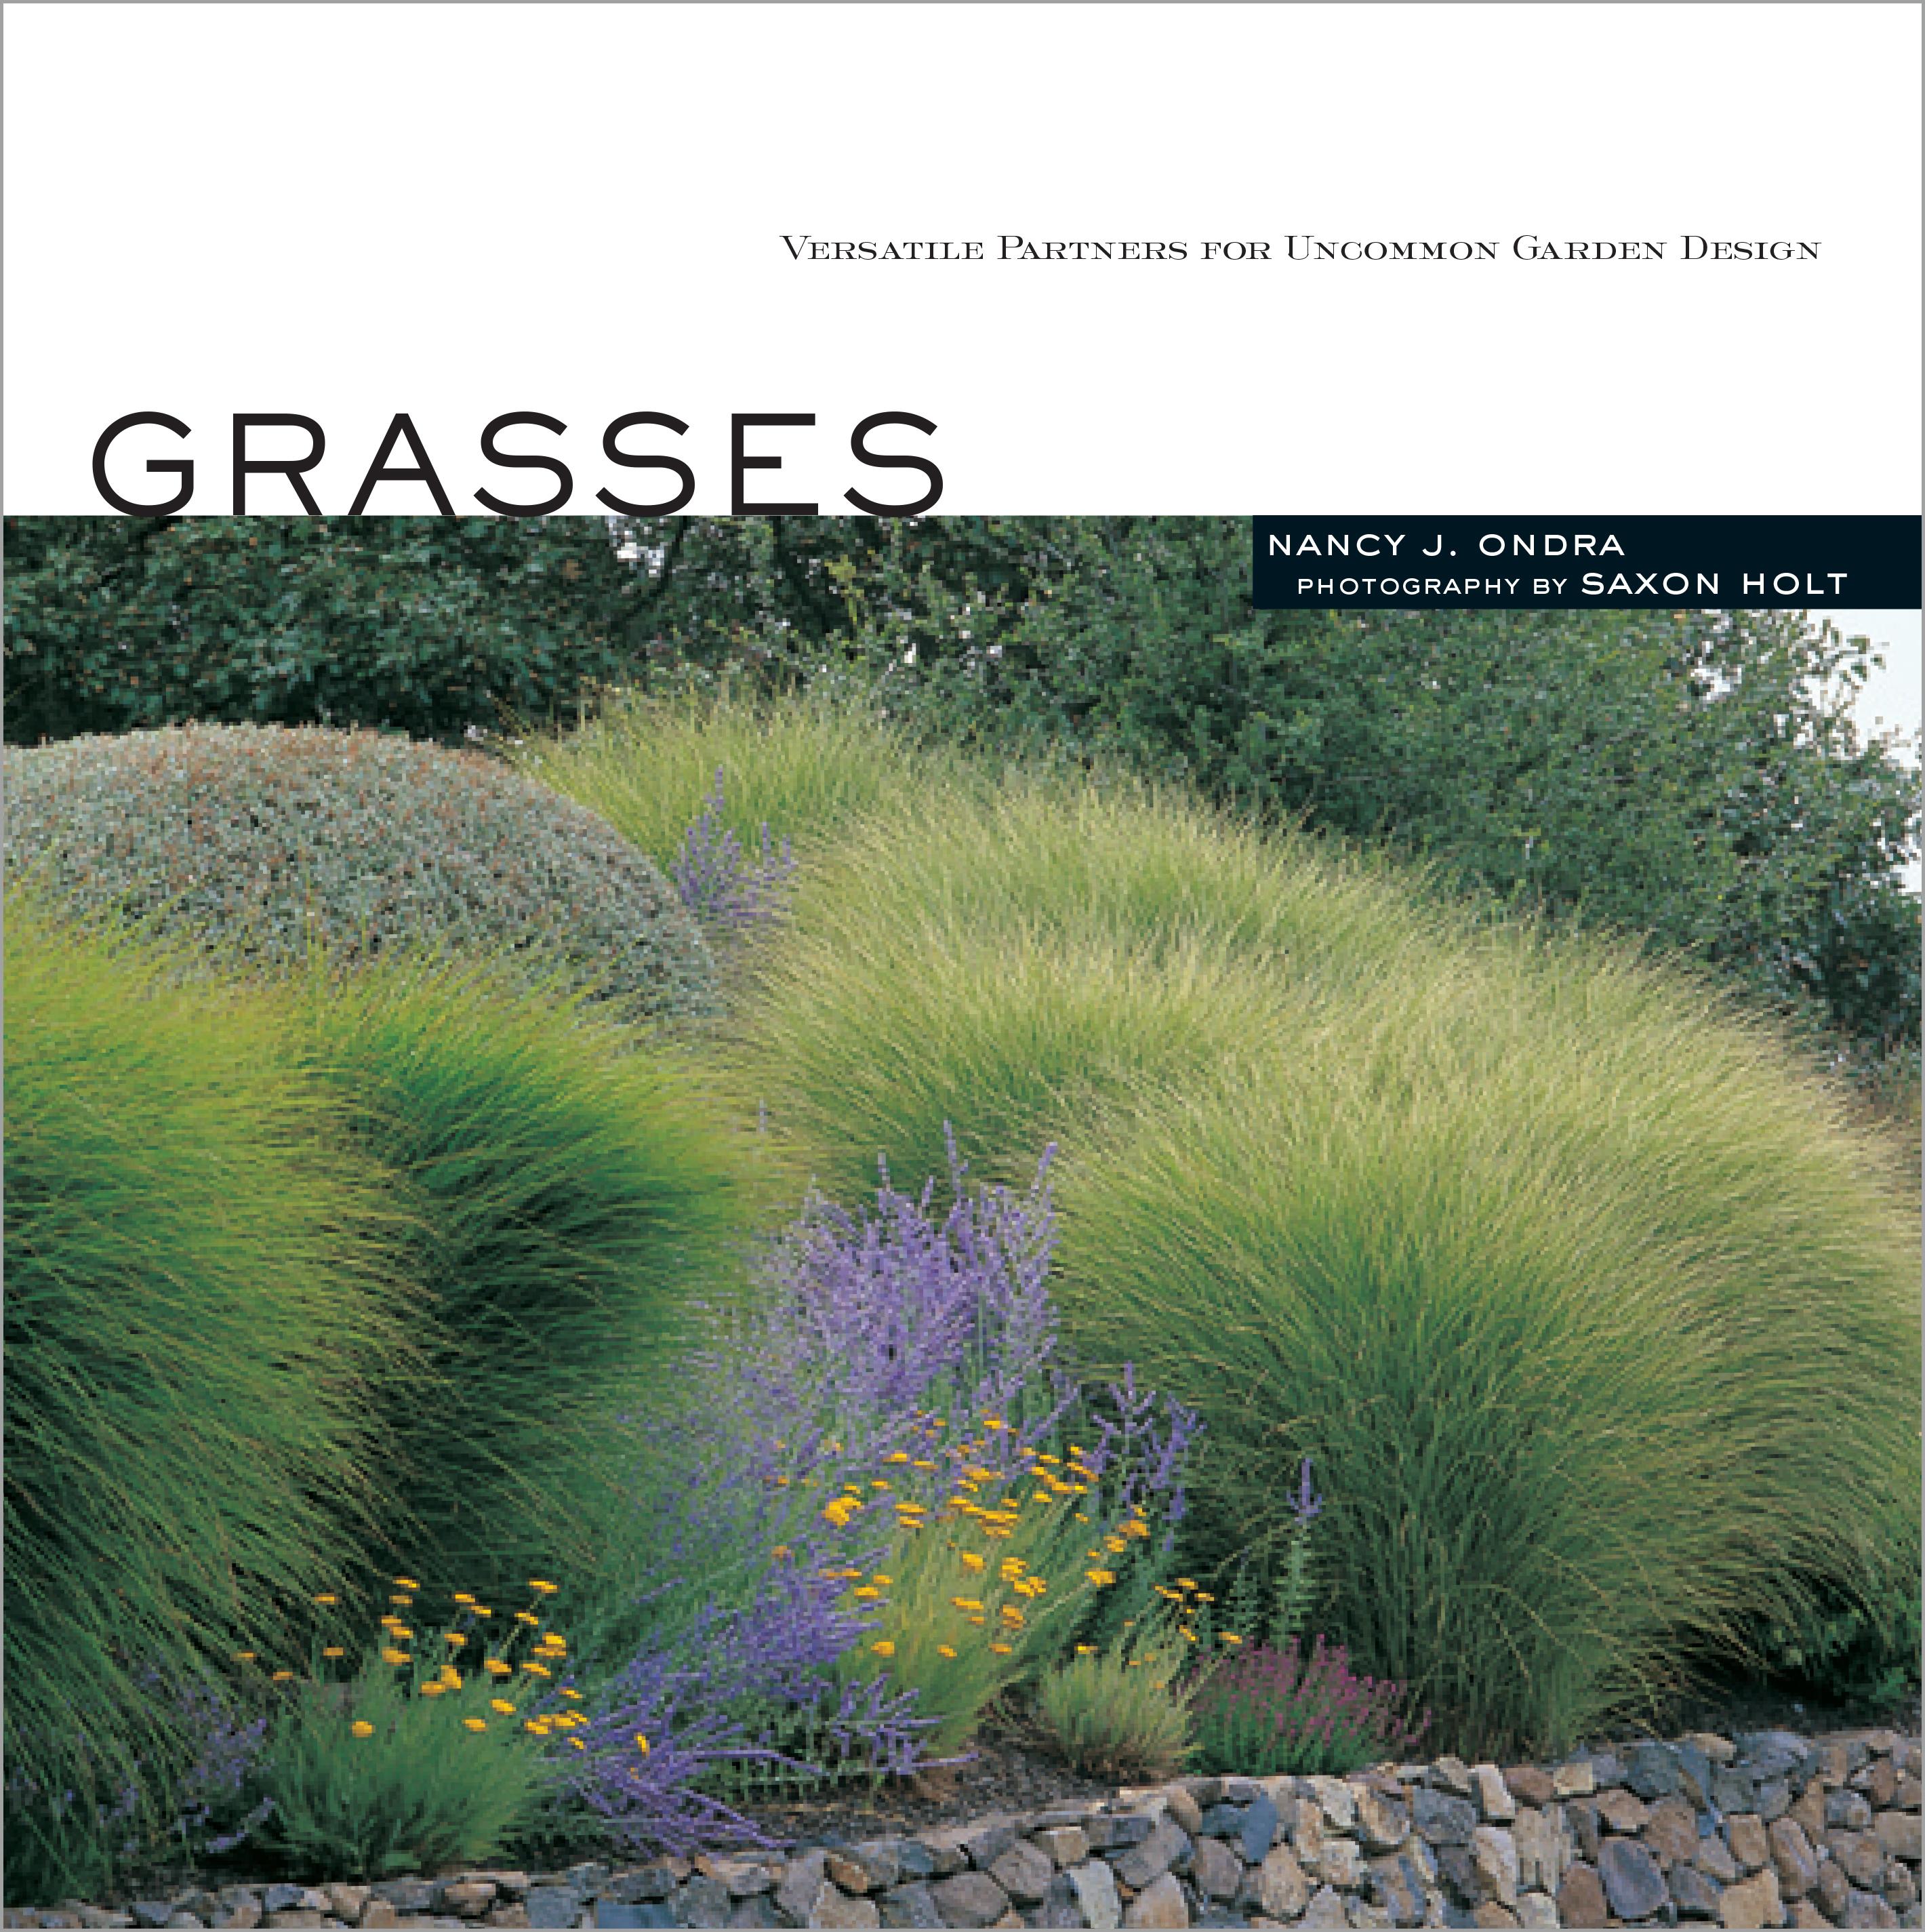 Grasses Versatile Partners for Uncommon Garden Design - Nancy J. Ondra